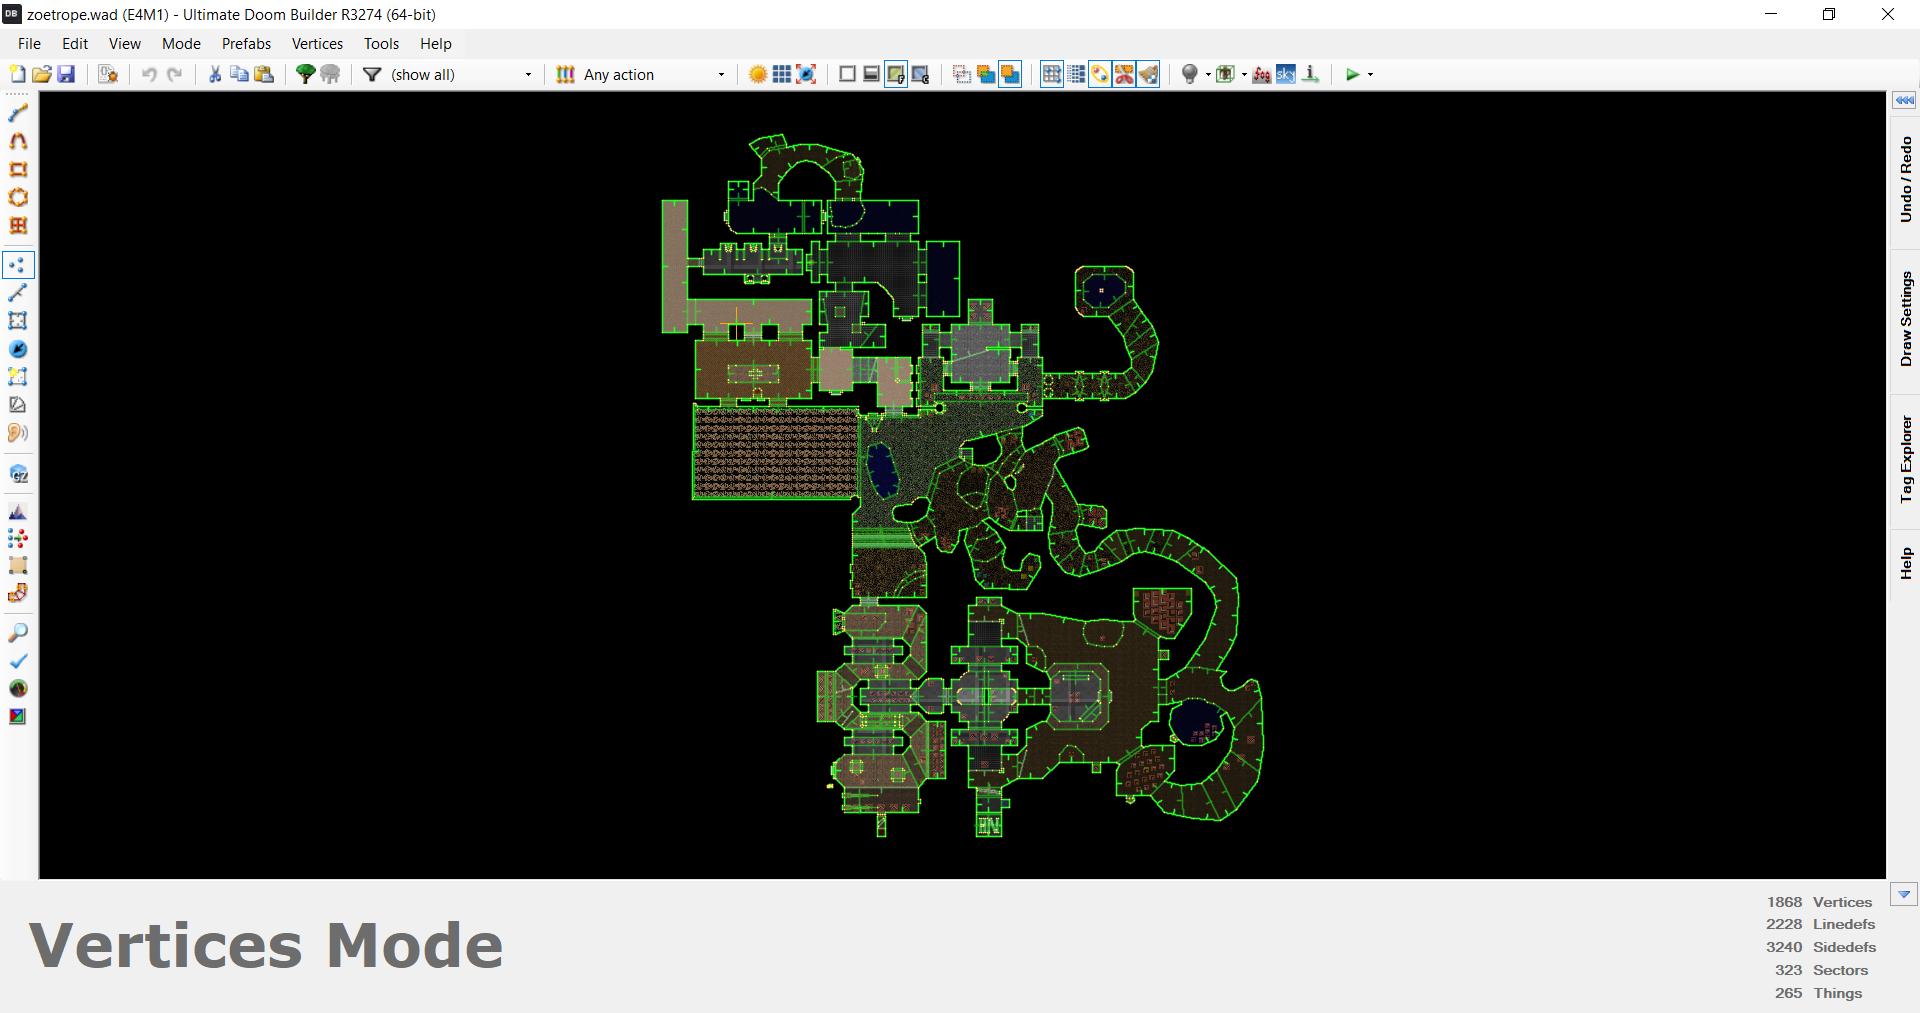 zoetrope.wad (E4M1) - Ultimate Doom Builder R3274 (64-bit) 2021-06-27 18_18_19.png